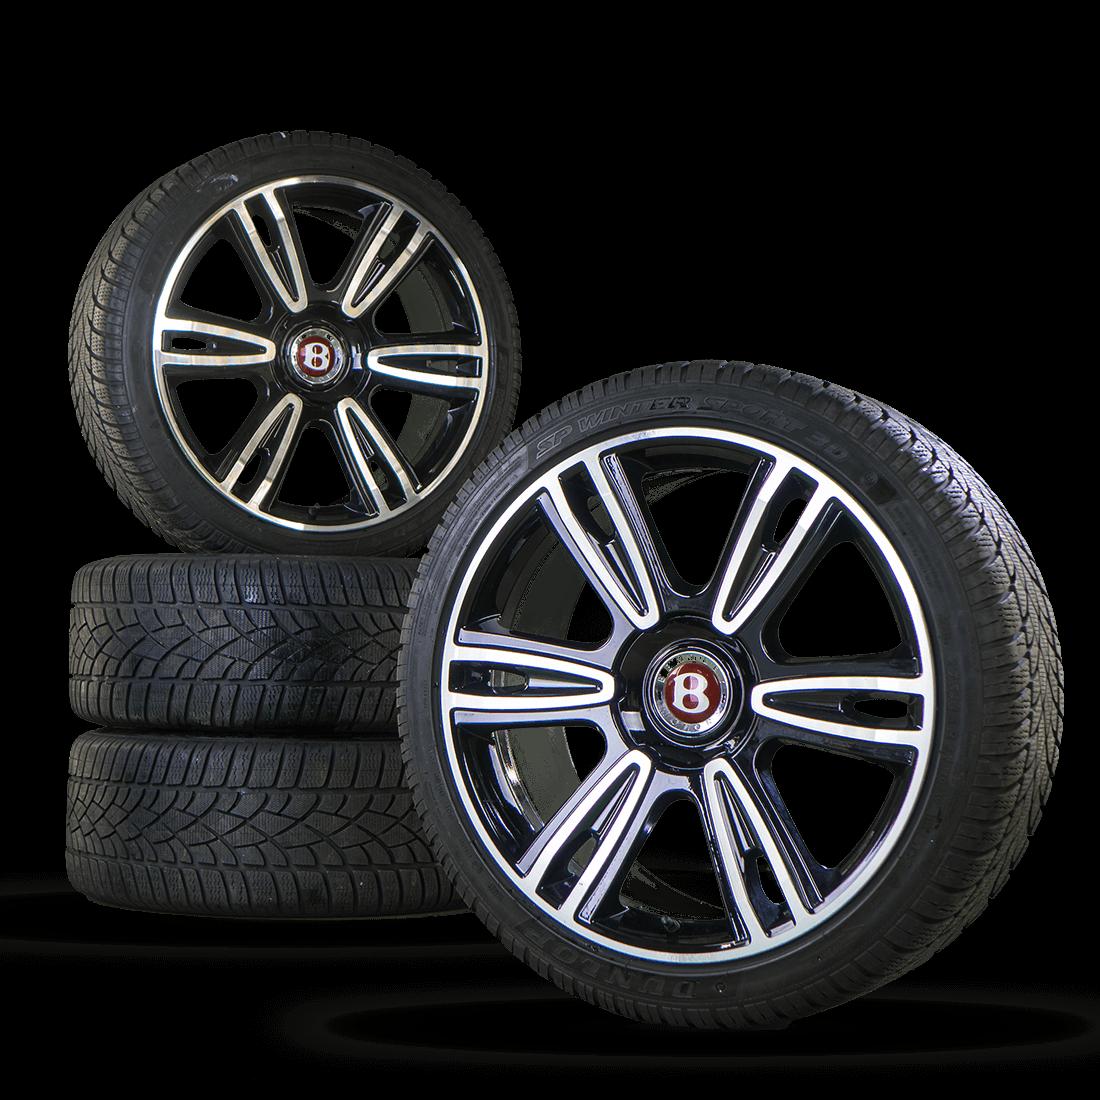 Bentley 21 Inch GT GTC Flying Spur Rims Aluminum Rims Winter